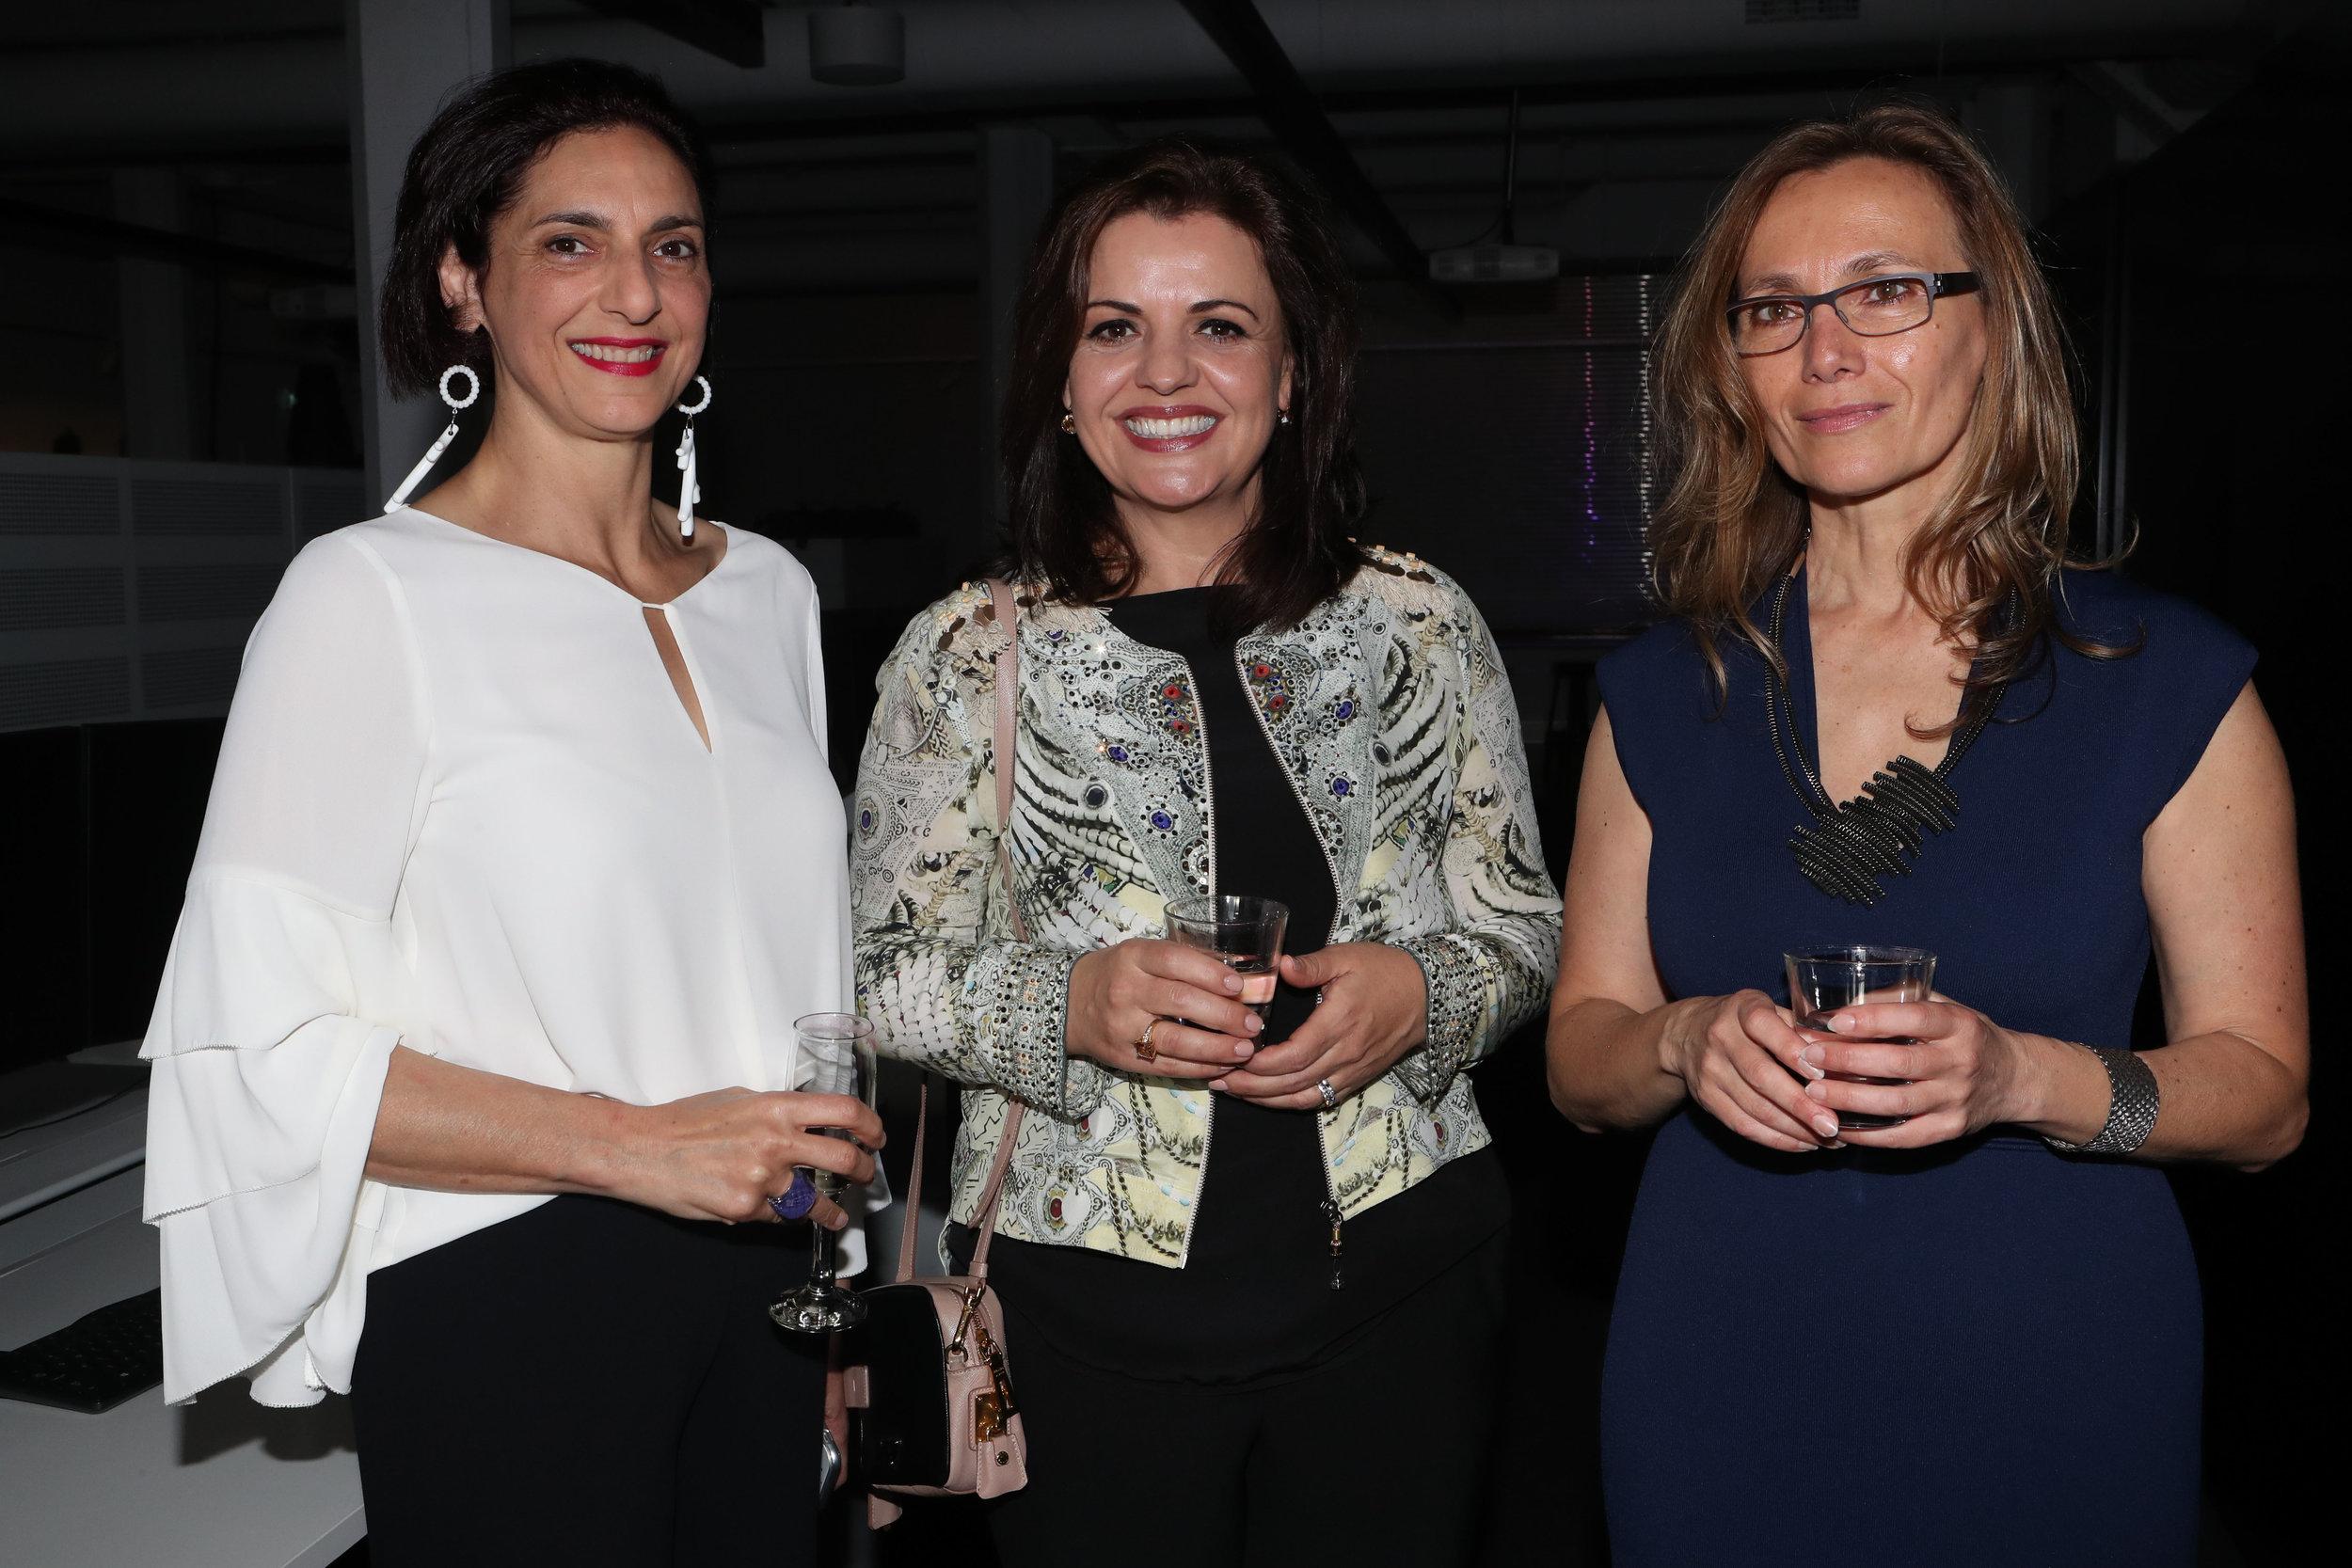 Freedy Coory, Gordana Milosevska and Ljiljana Gazevic (2).jpg